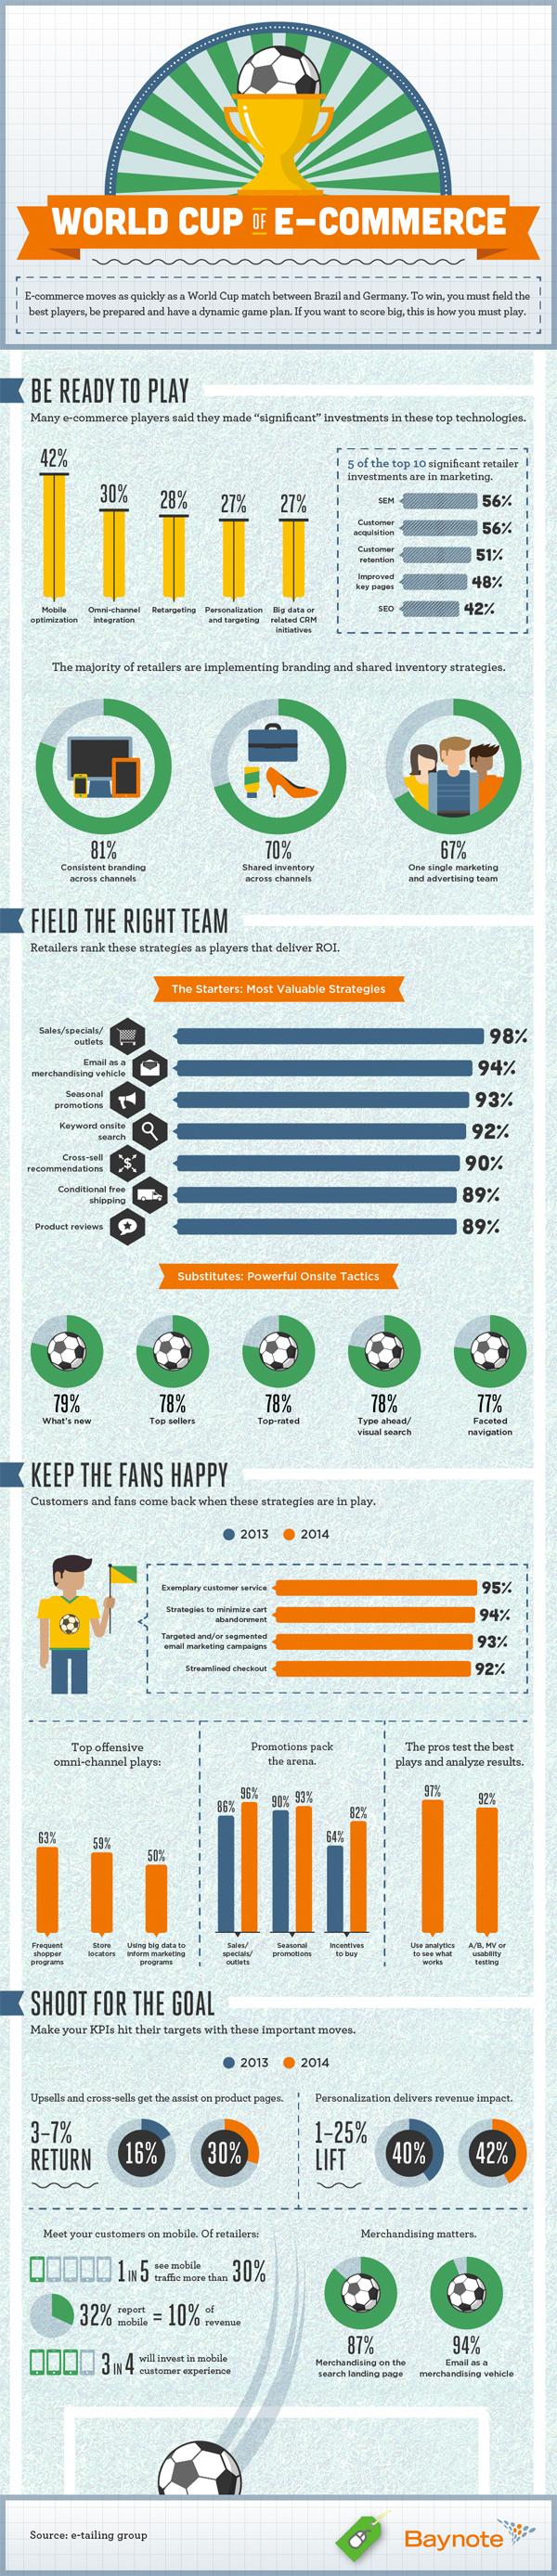 coppa del mondo dell'ecommerce - infografica - ecommerce guru